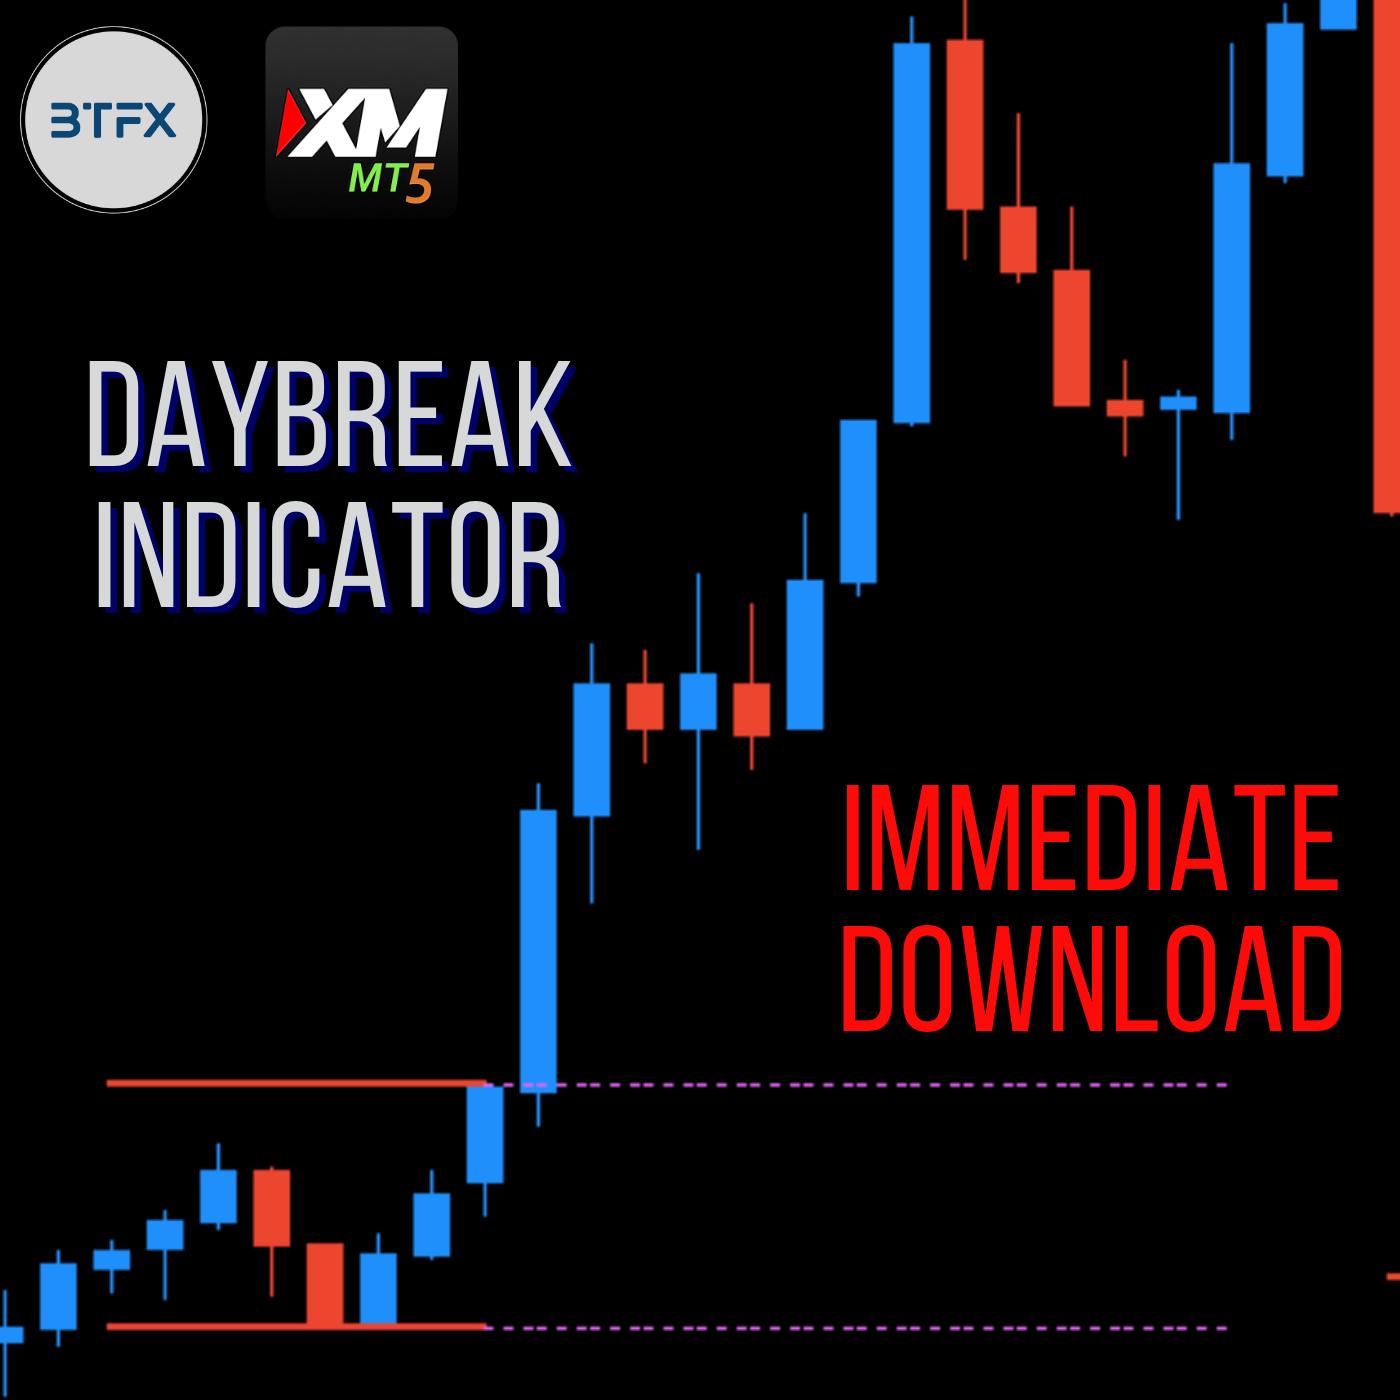 DayBreak MT5 Indicator